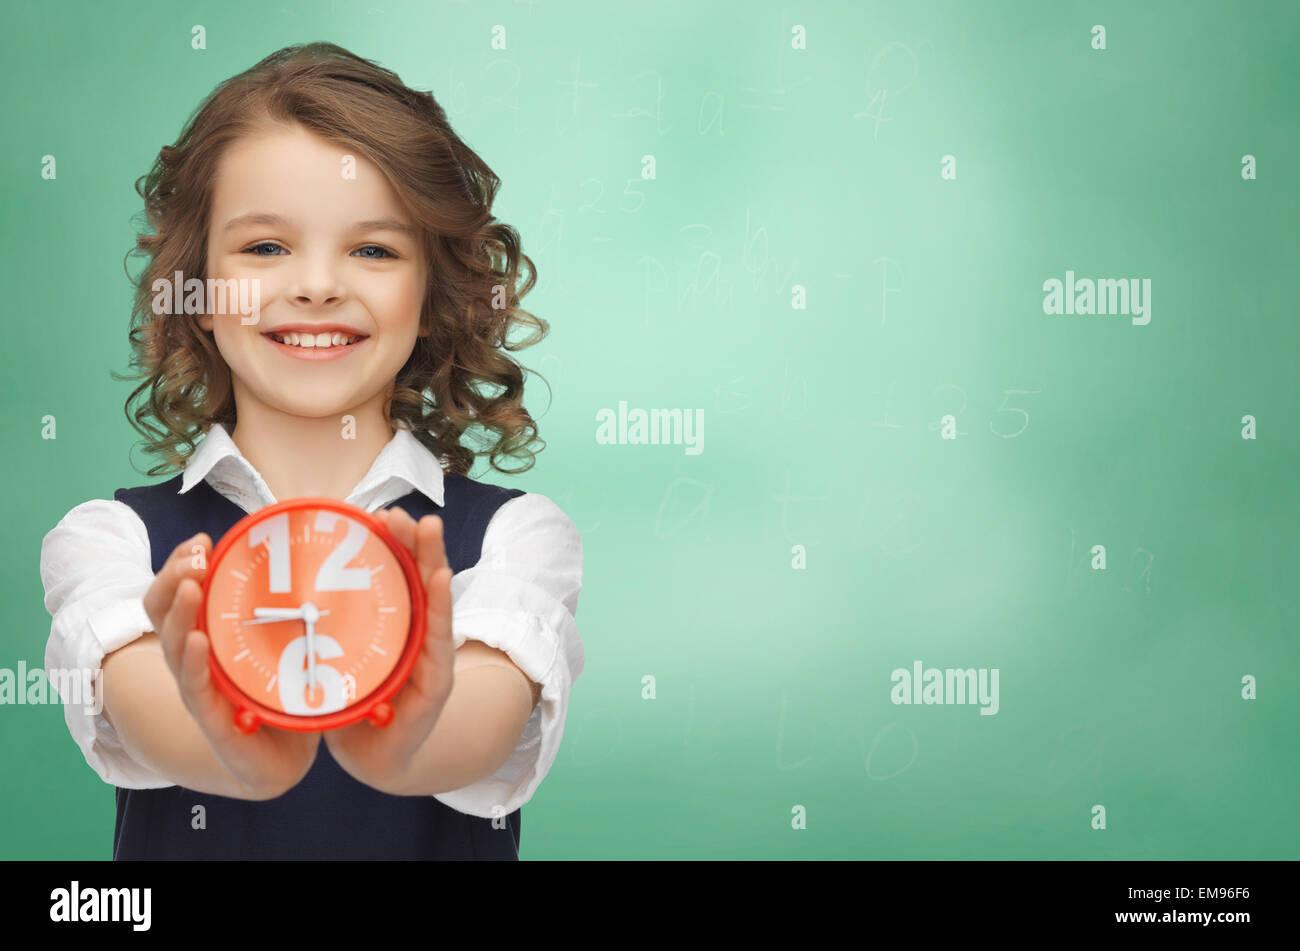 happy girl with alarm clock - Stock Image